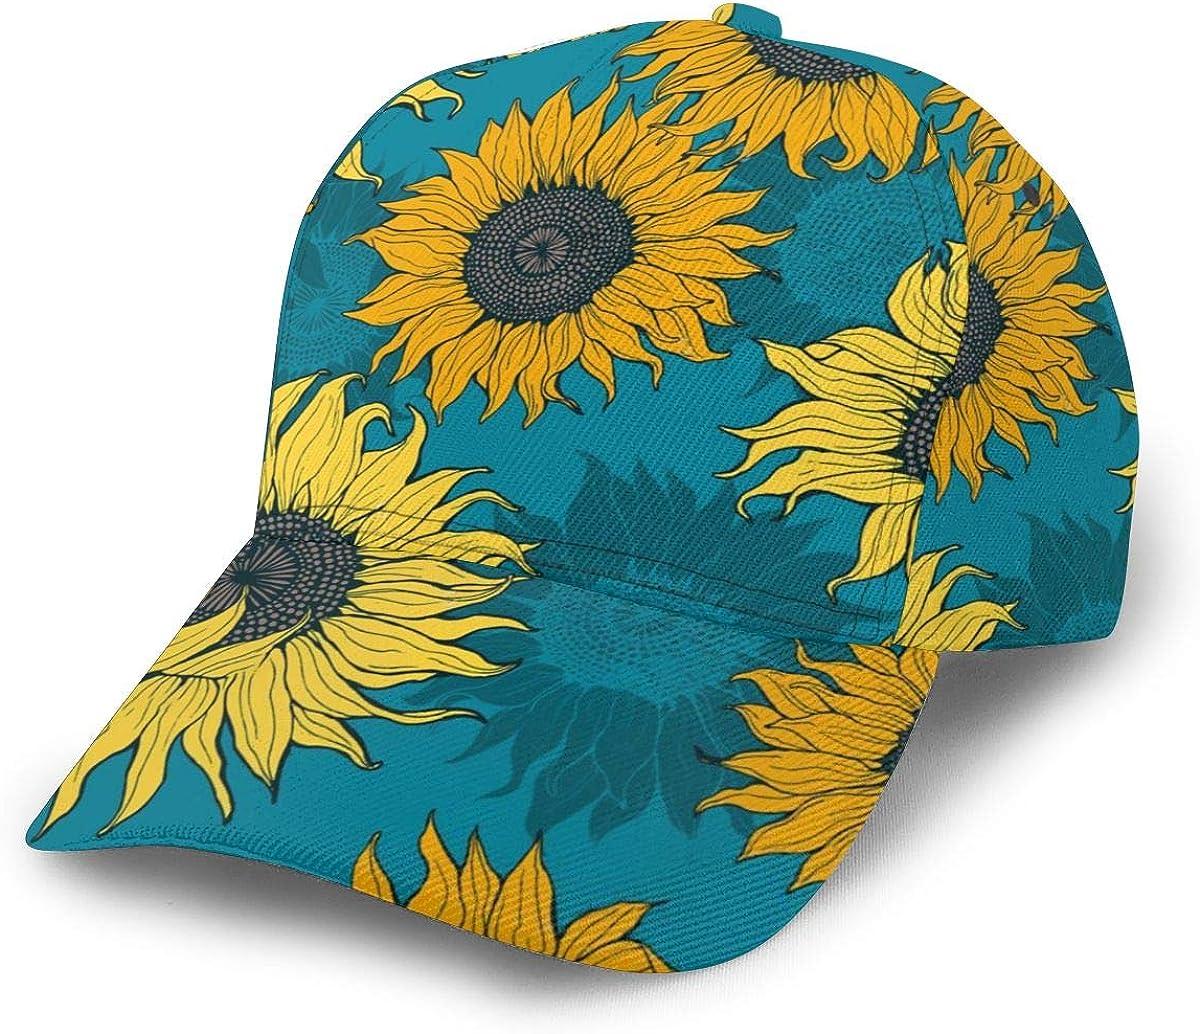 Yellow Sunflowers On A Blue2 Women Vintage Baseball Cap Unisex Adjustable Baseball Hats Dad Hat